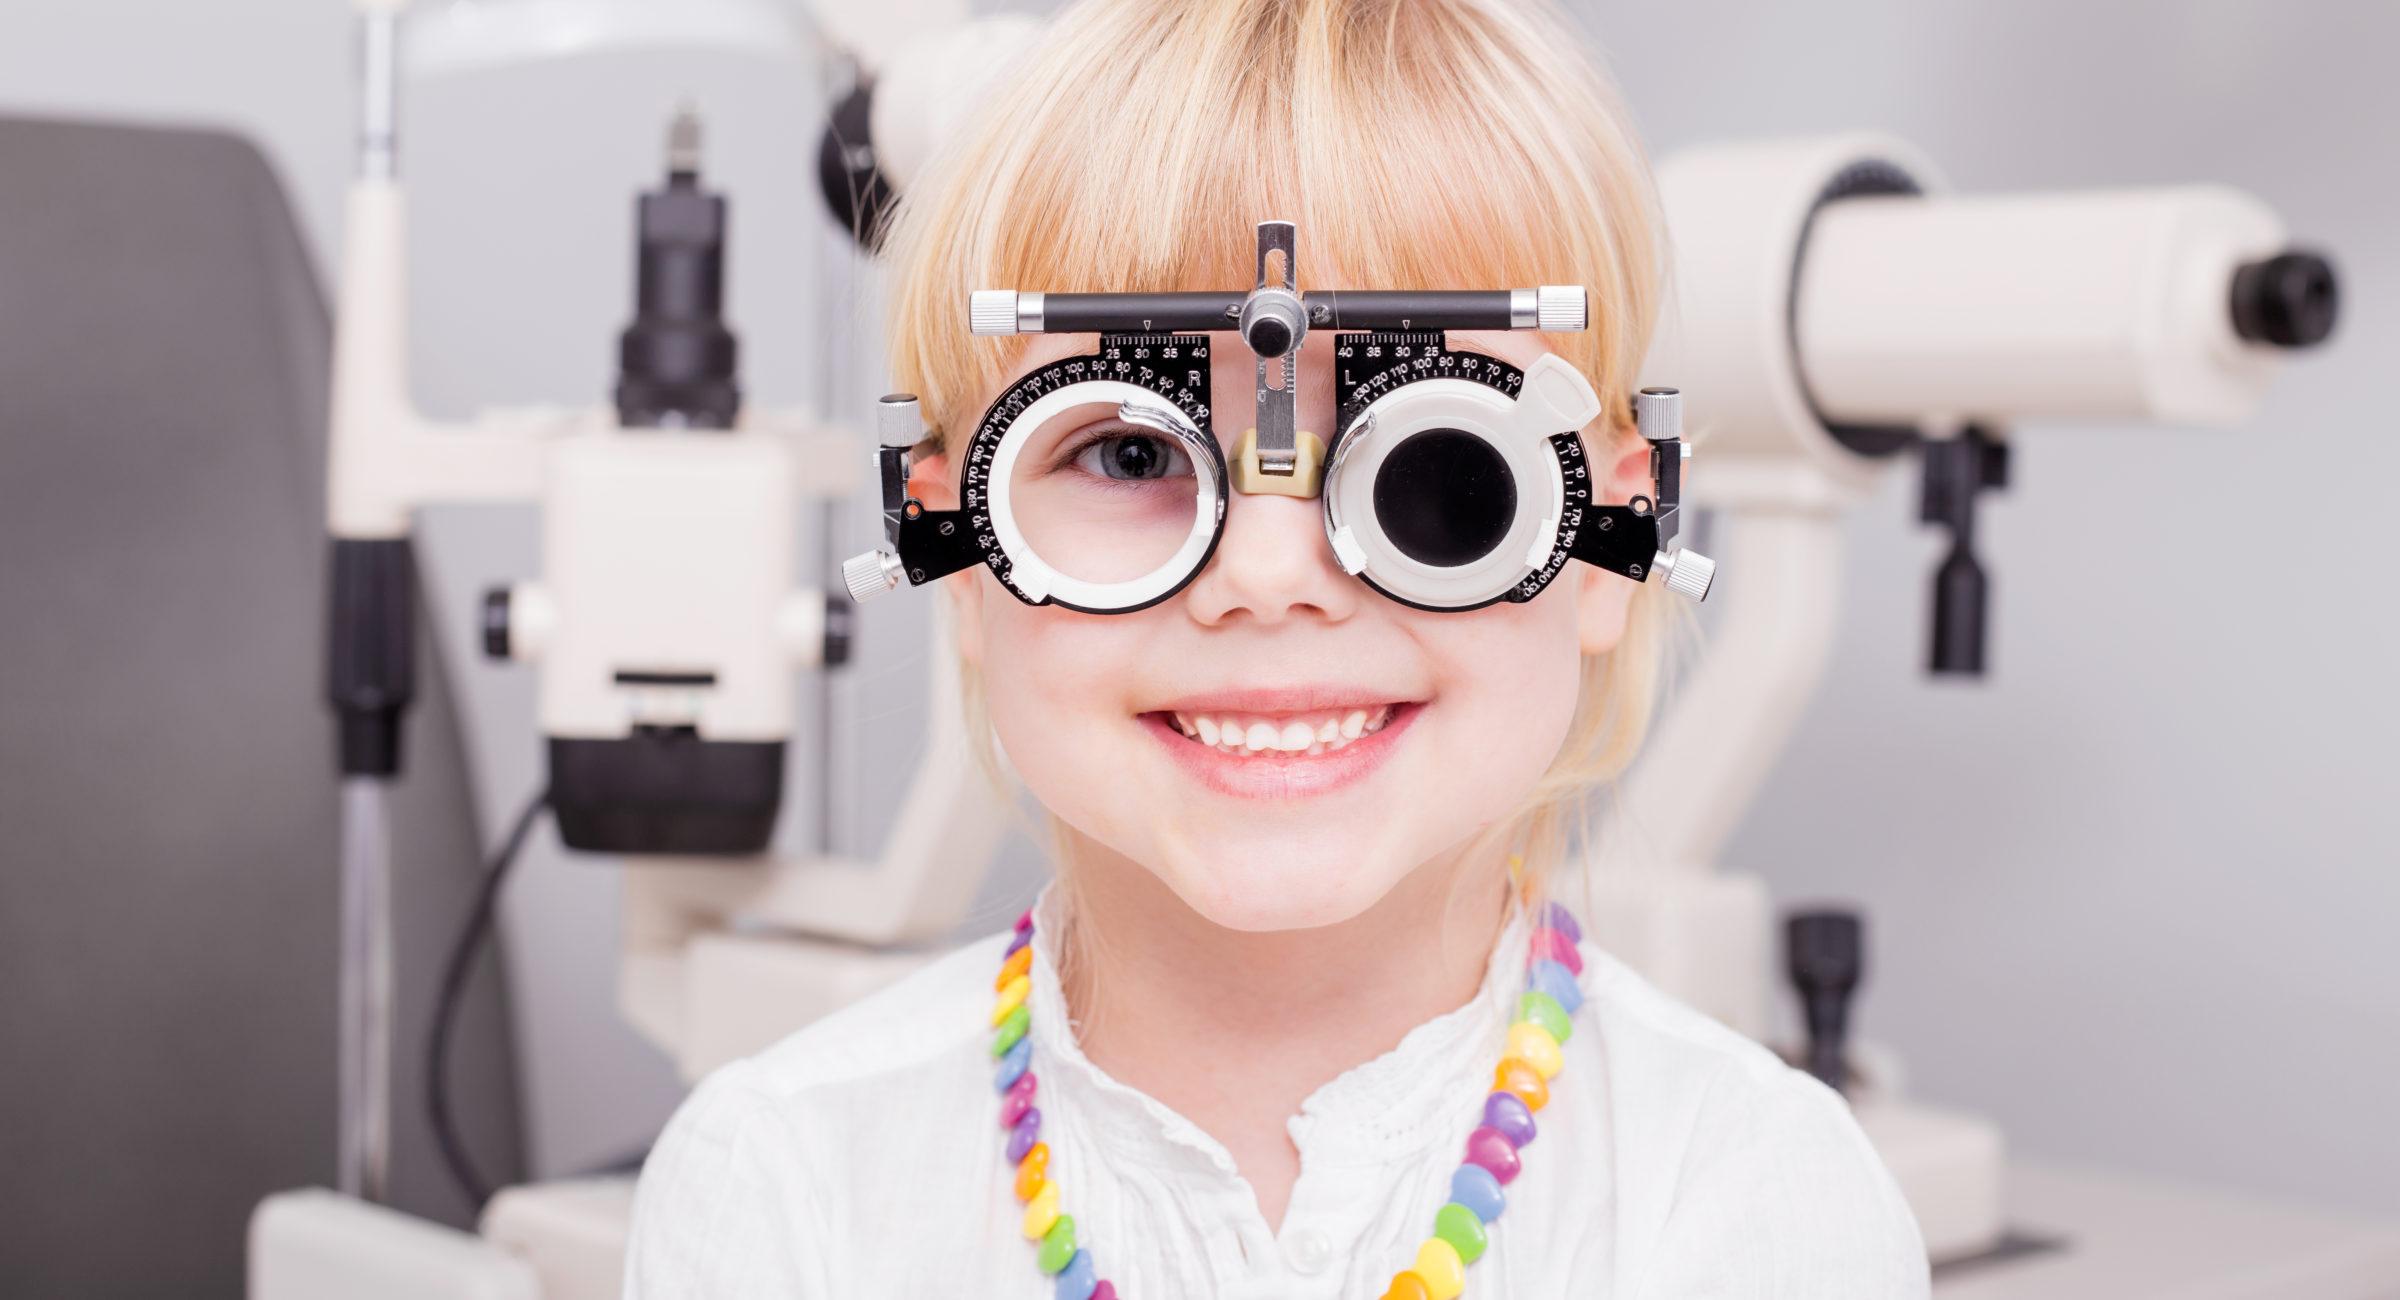 Little girl checking her vision